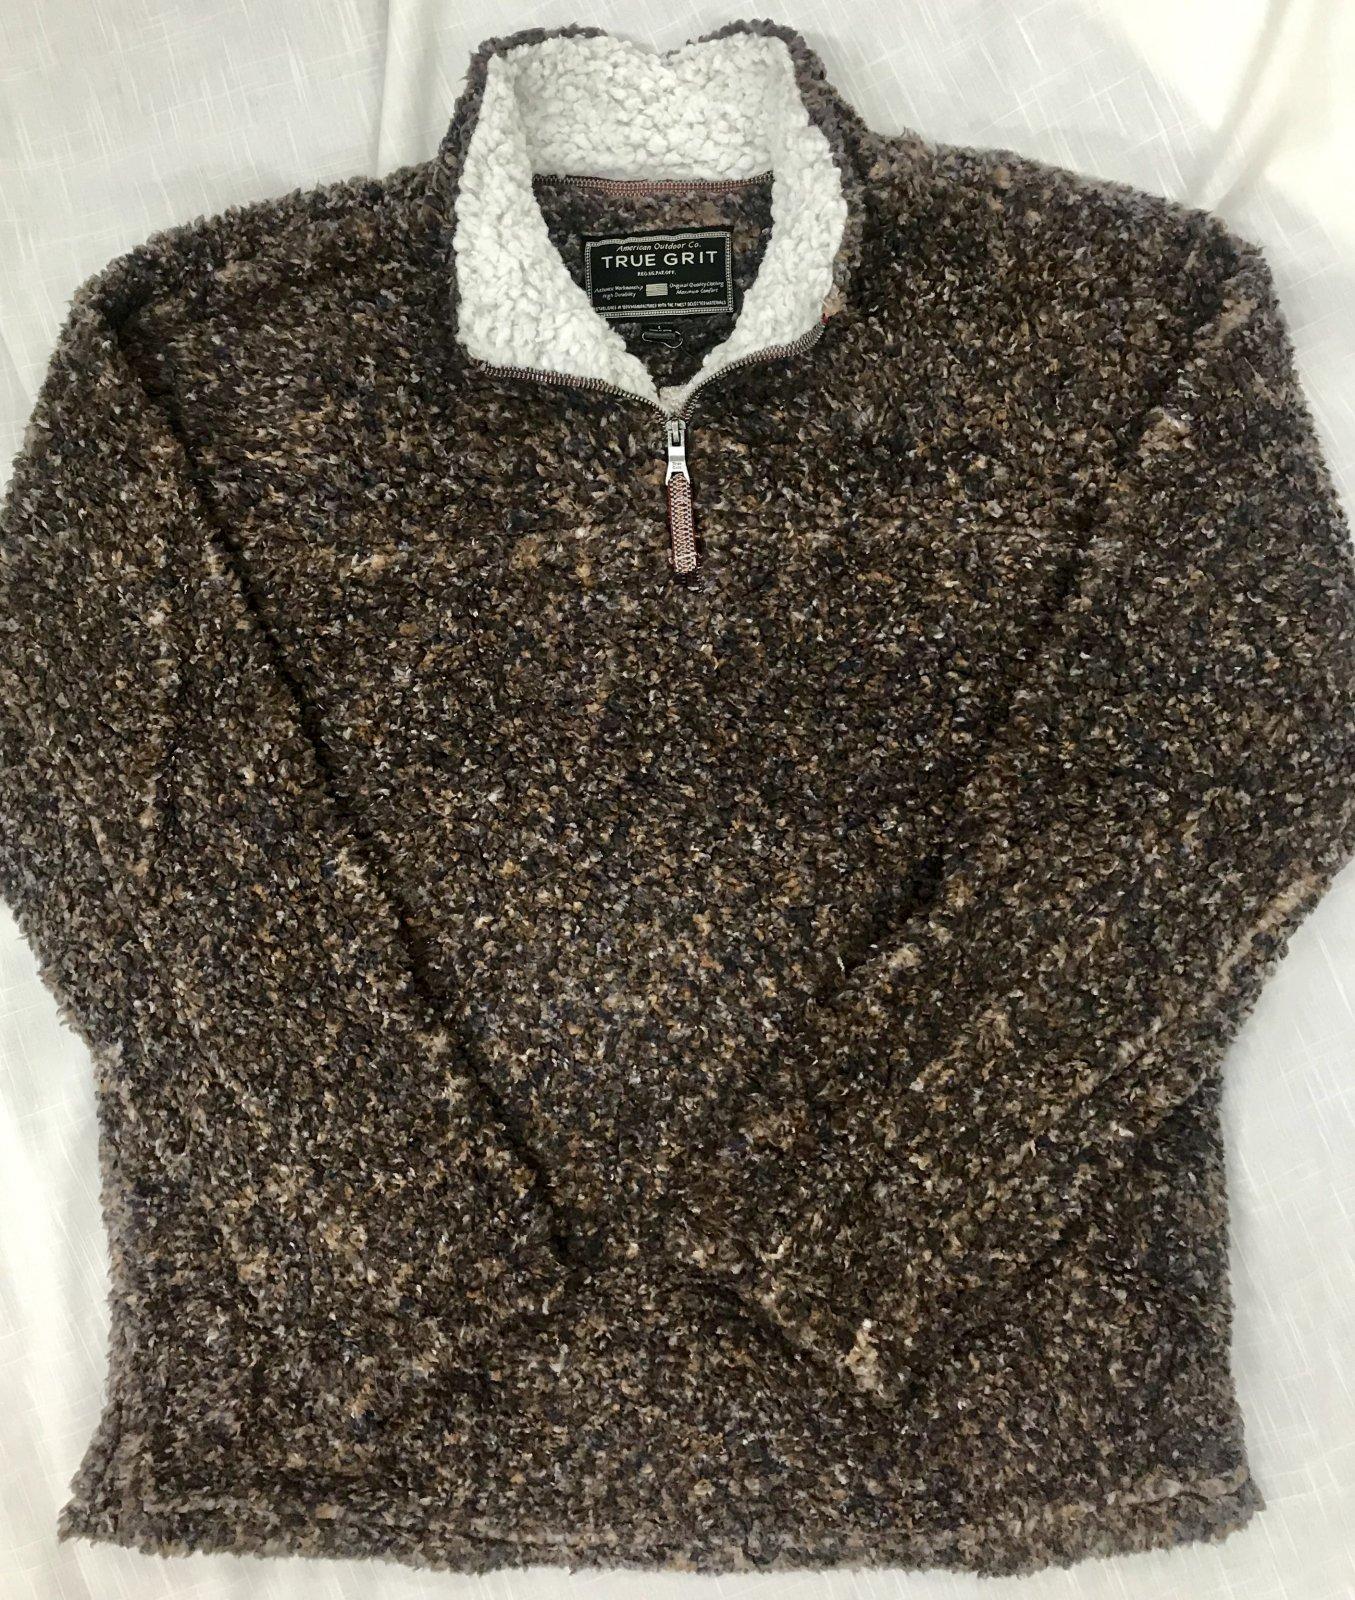 True Grit Texture Sherpa 1/4 Zip Pullover 91M65SOH